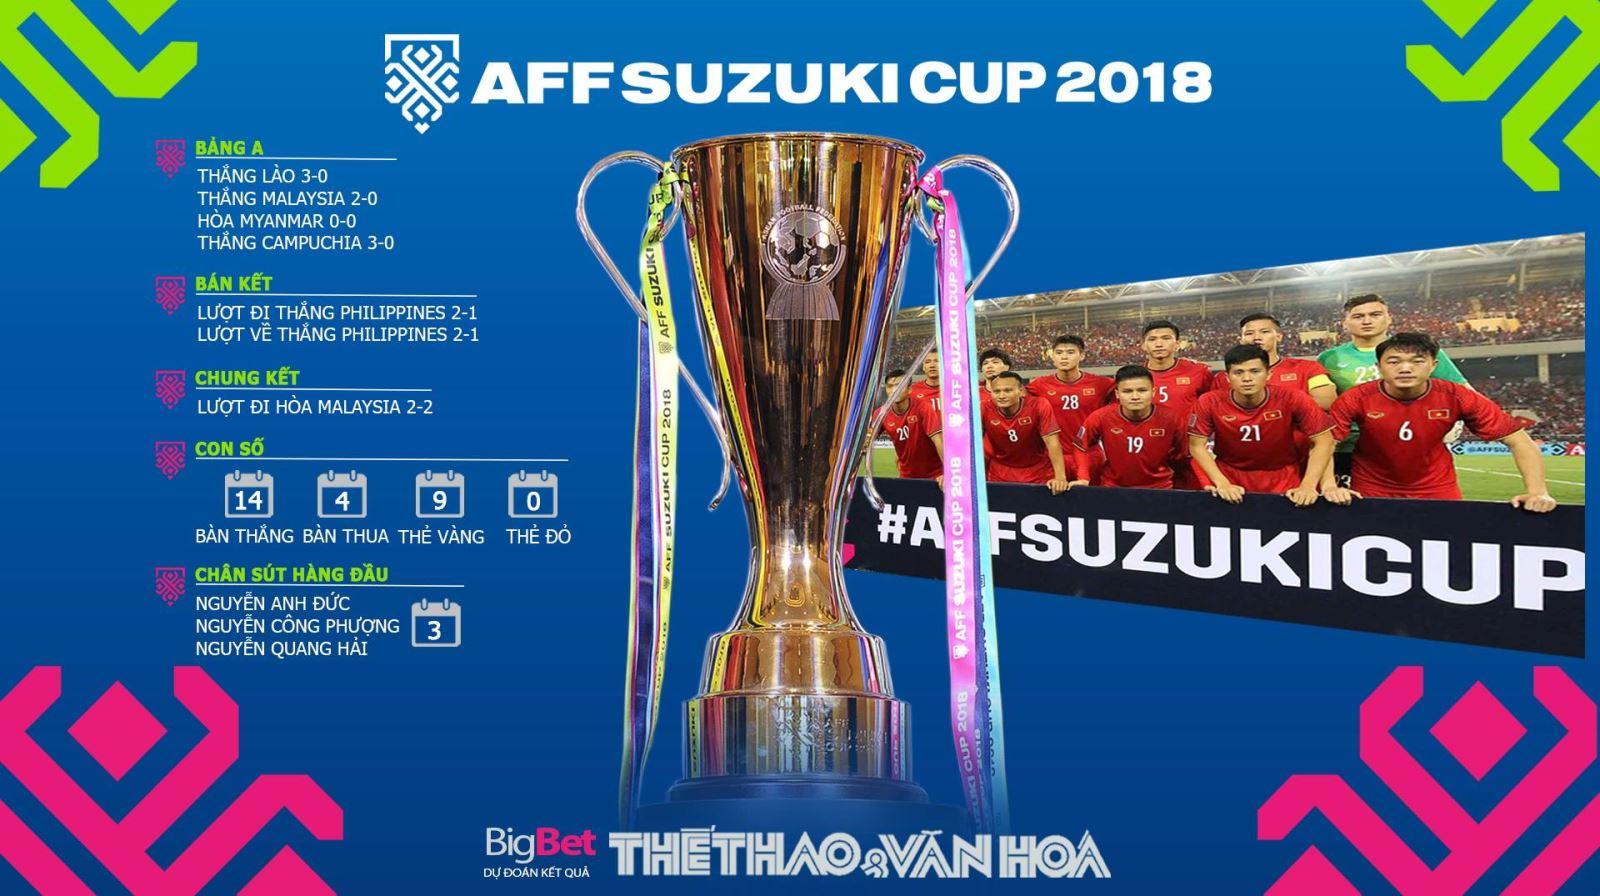 VTV6, truc tiep bong da, VTC3, VTV5, vtv6 truc tiep bong da, trực tiếp bóng đá vtv6, bong da, xem vtv6, VIỆT NAM, Malaysia, VIỆT NAM Malaysia, lịch thi đấu AFF Cup 2018.